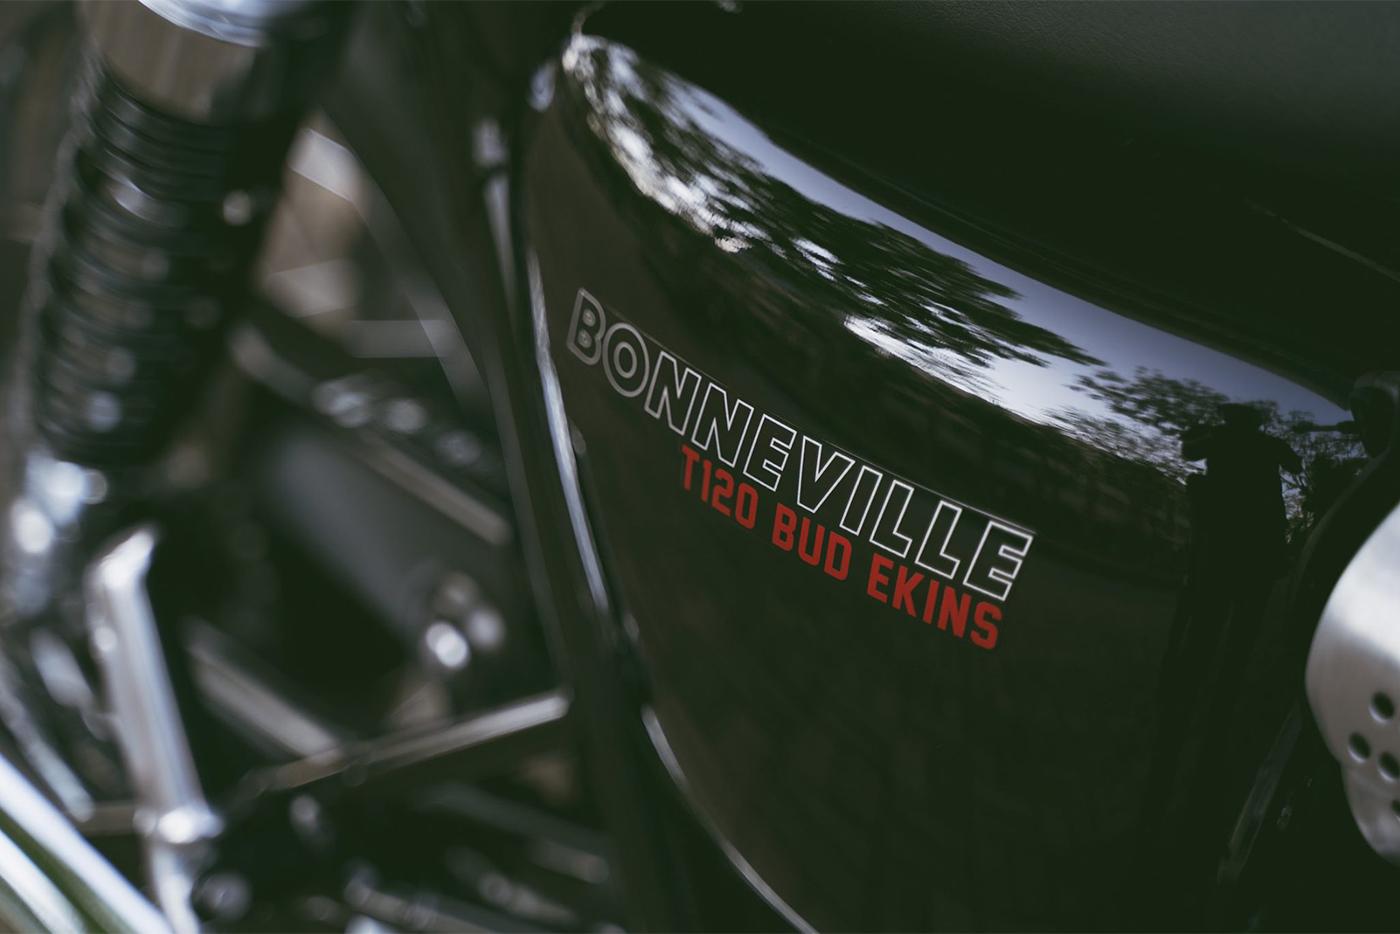 bonneville-bud-ekins-t120-4.jpg